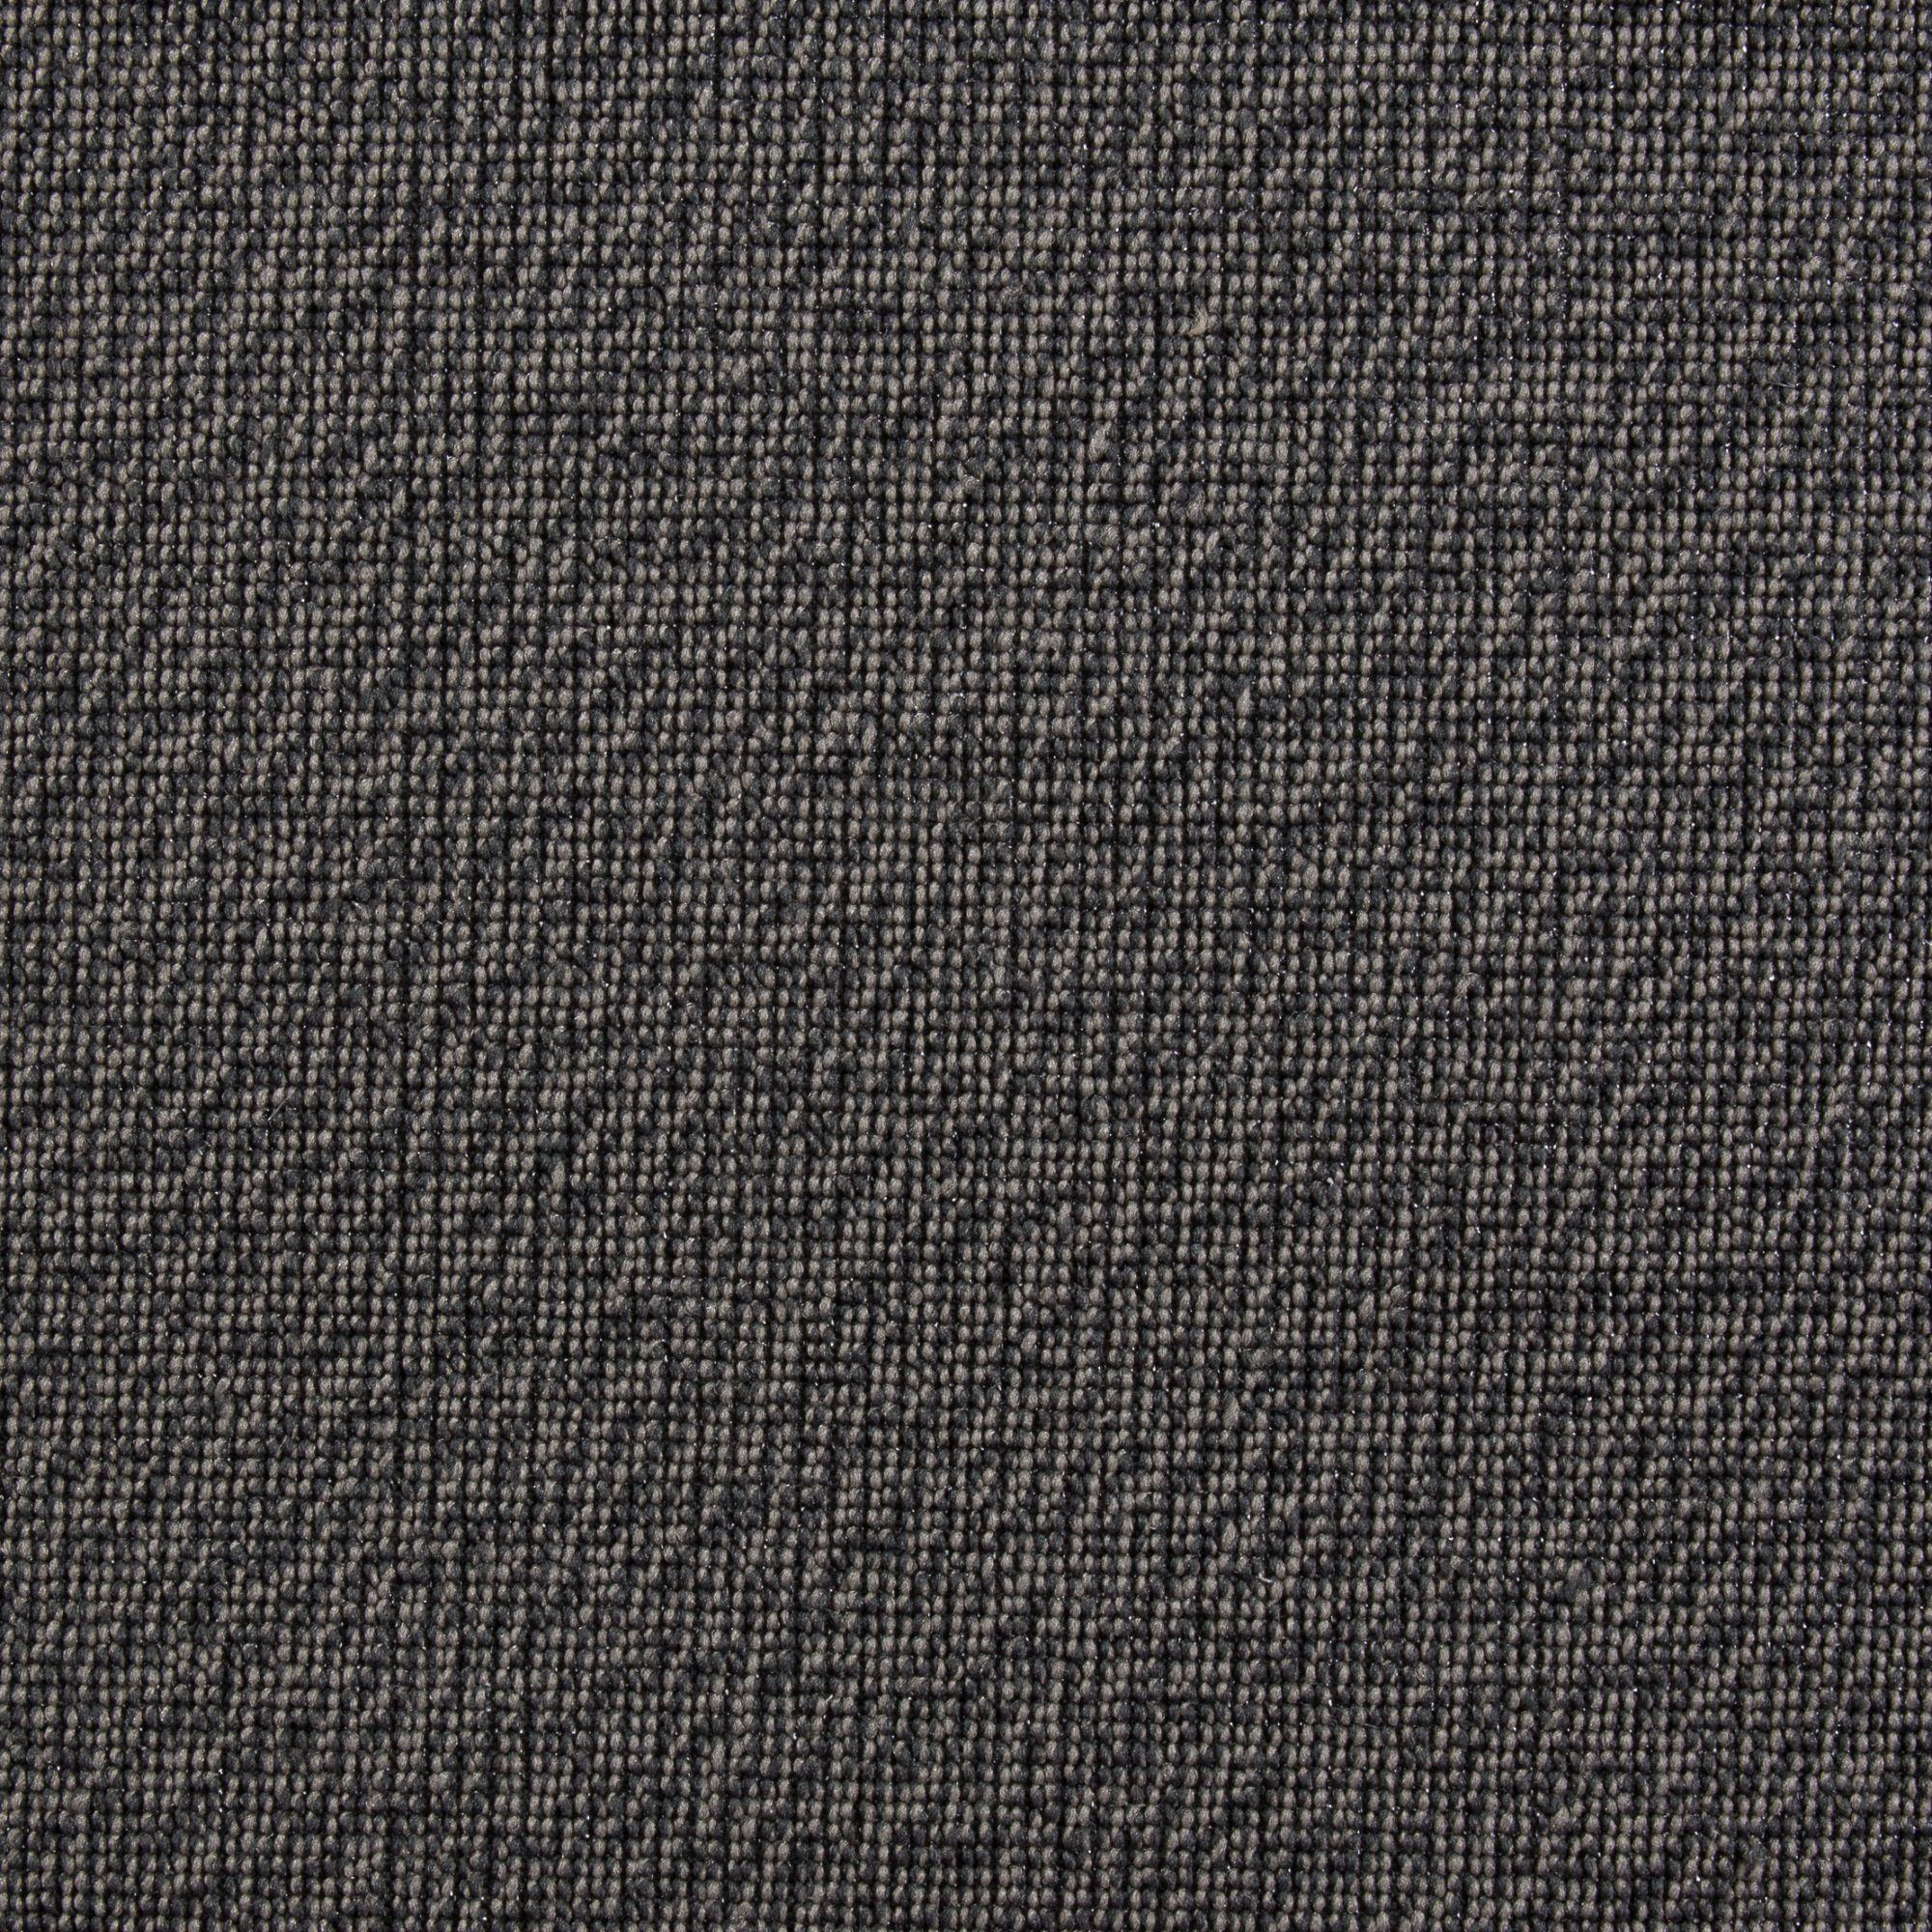 Bona Fide (1076-J0405)